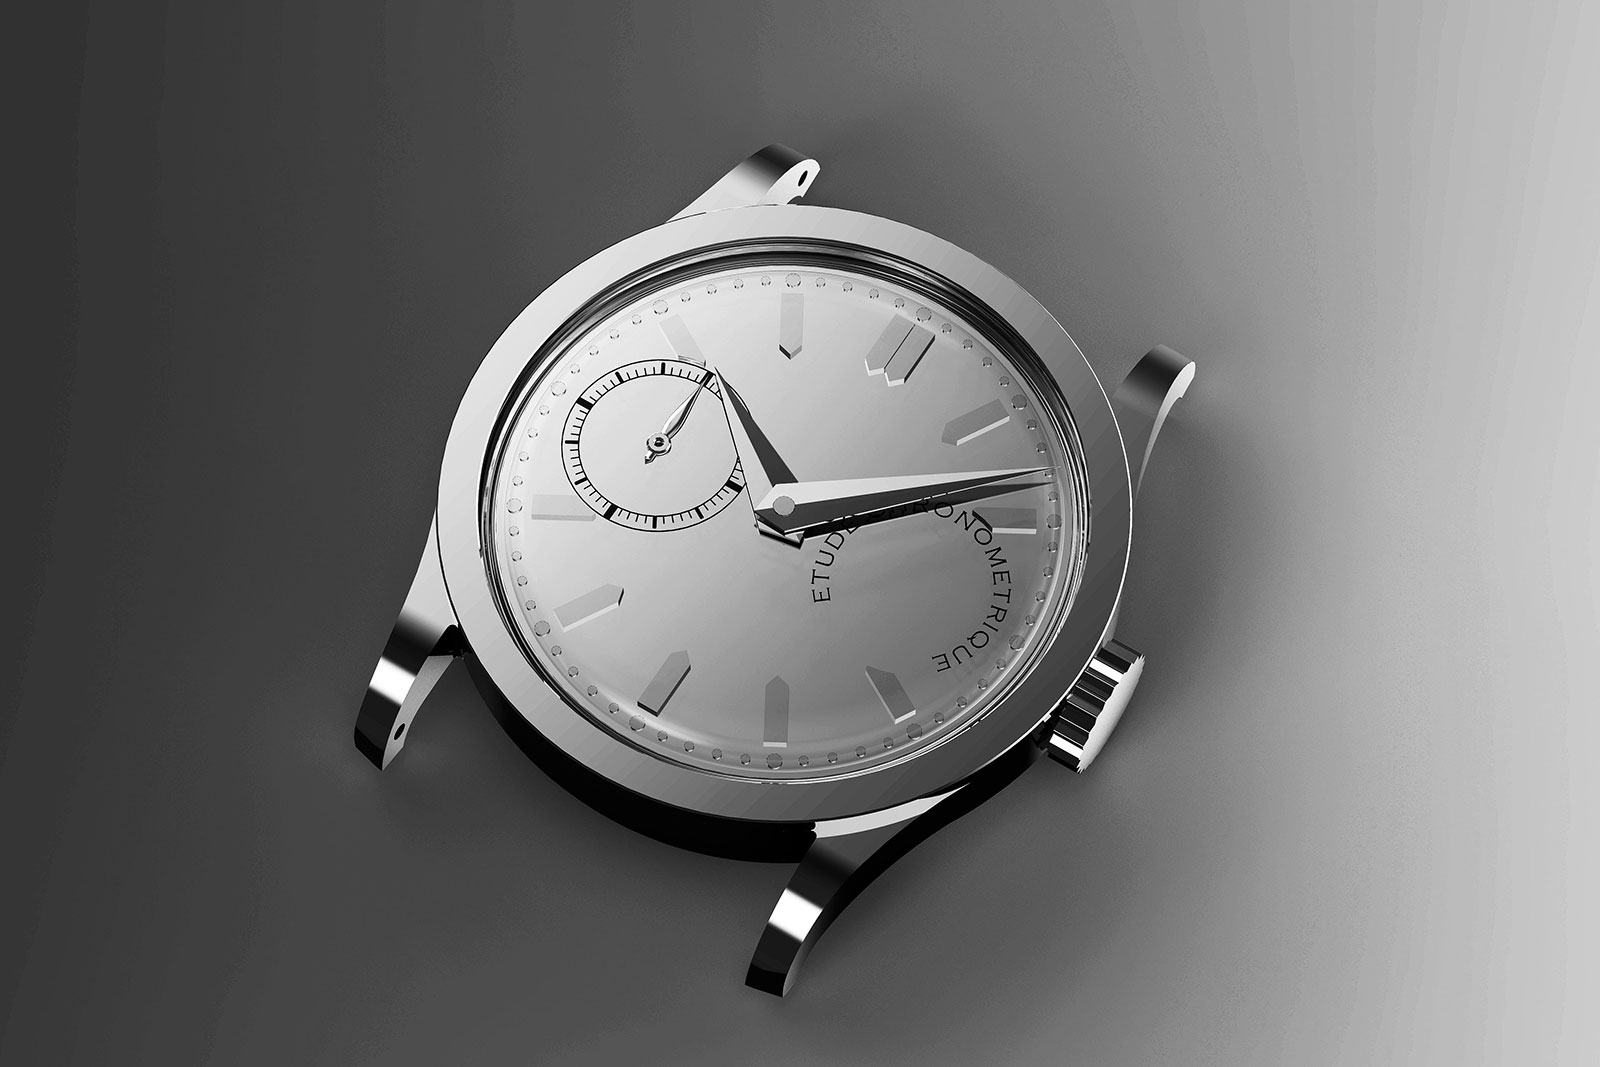 Yusuke Kikuchi Beta chronometre 2